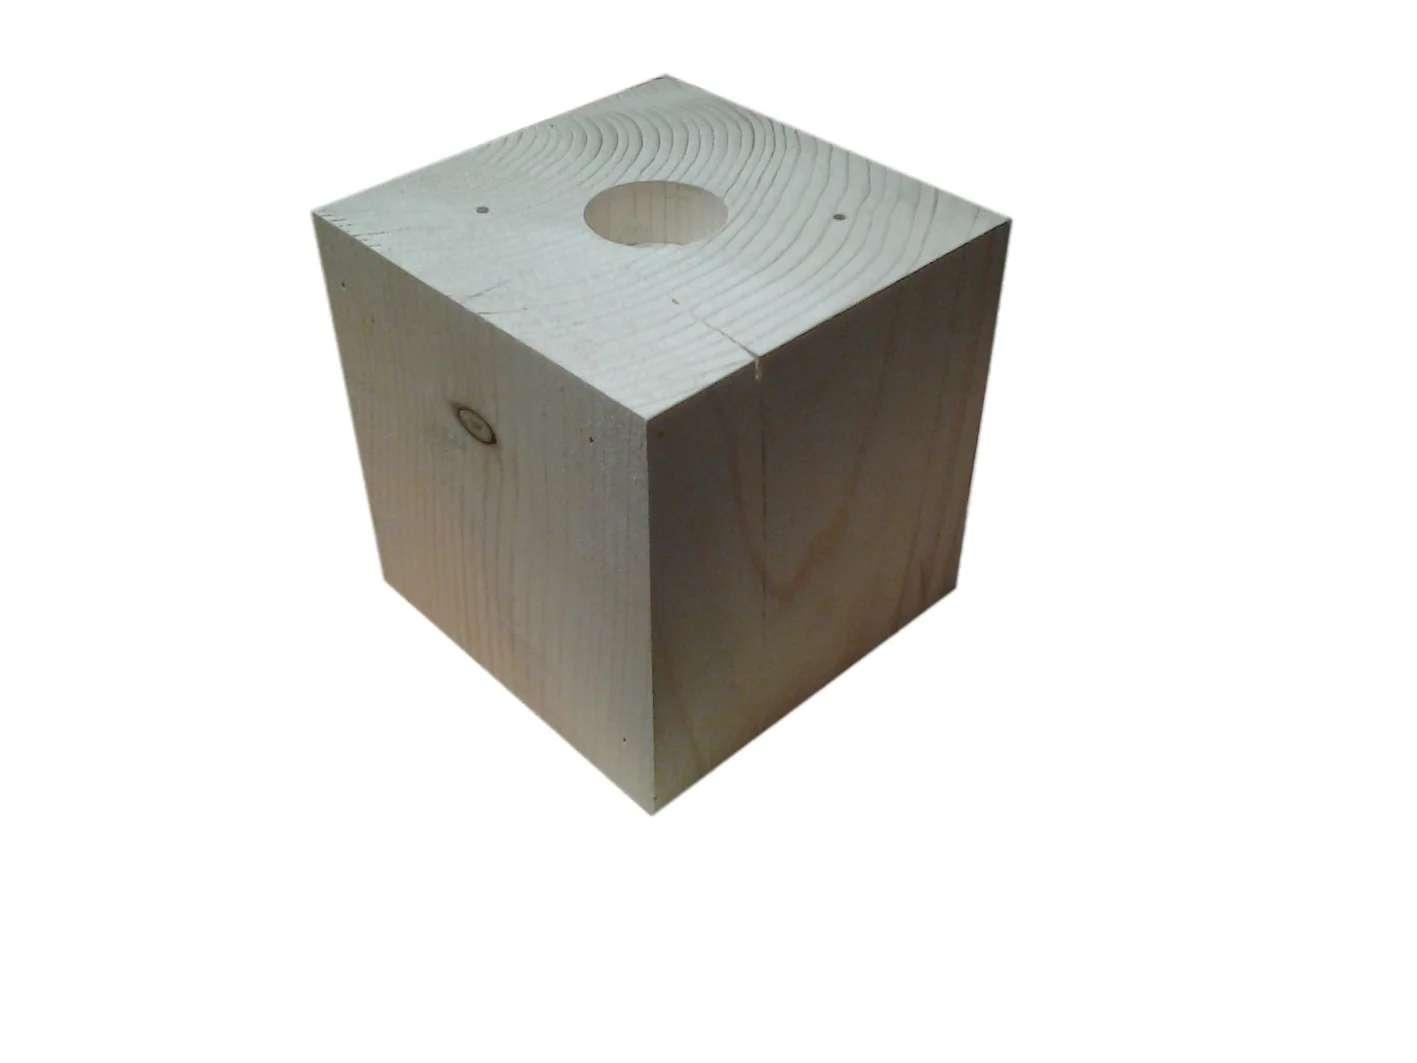 Cube En Bois Sapin 8x8x8 Cm Perce D Un Trou 40 Mm Leroy Merlin